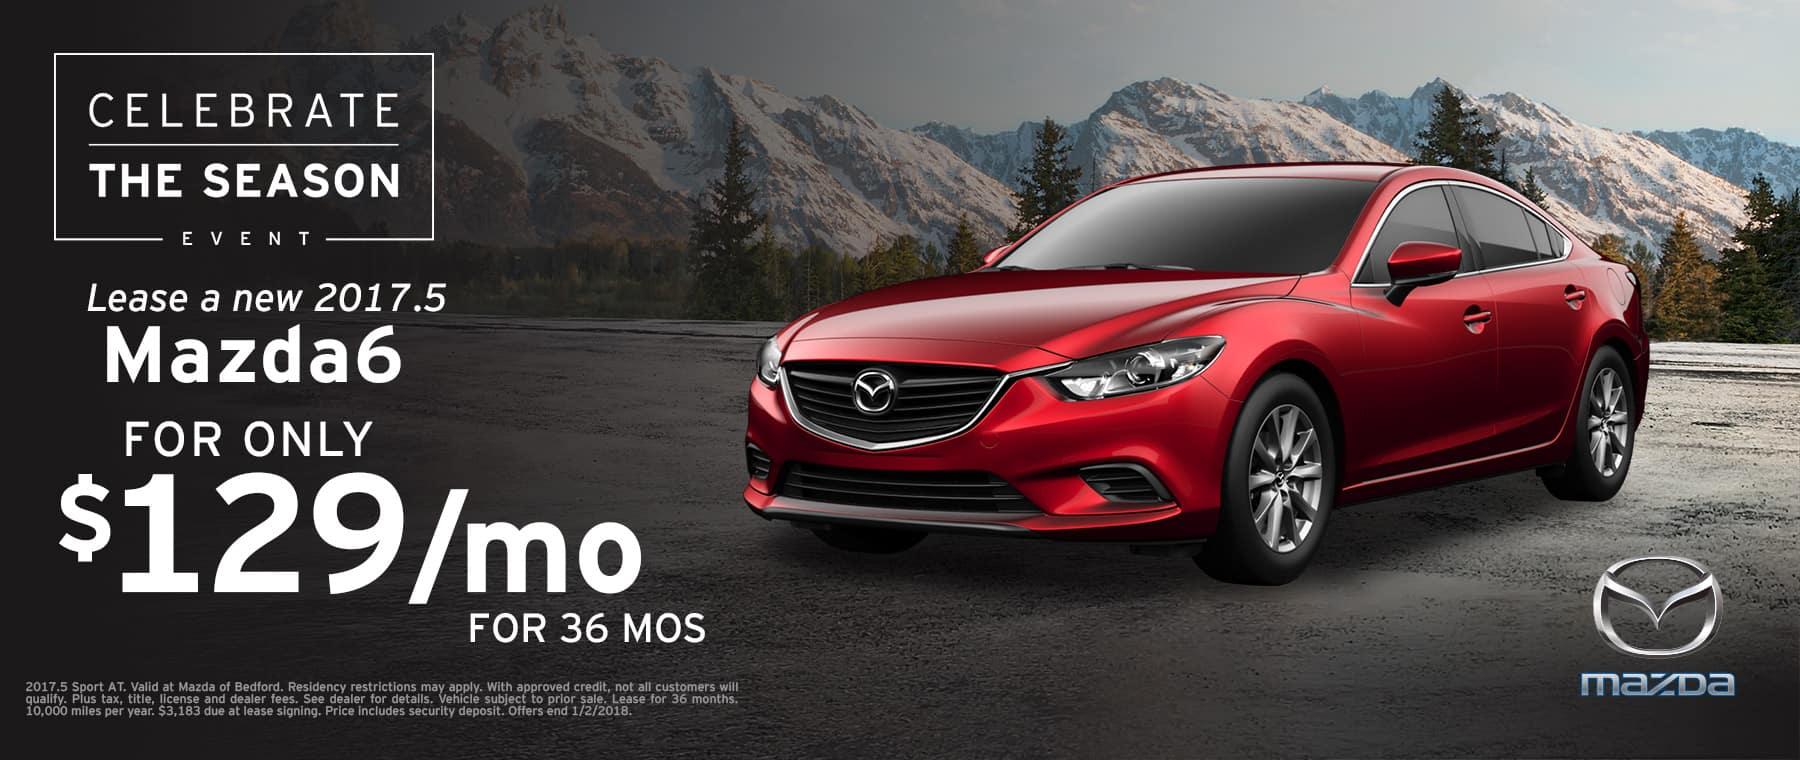 2017.5 Mazda6 Lease Offer